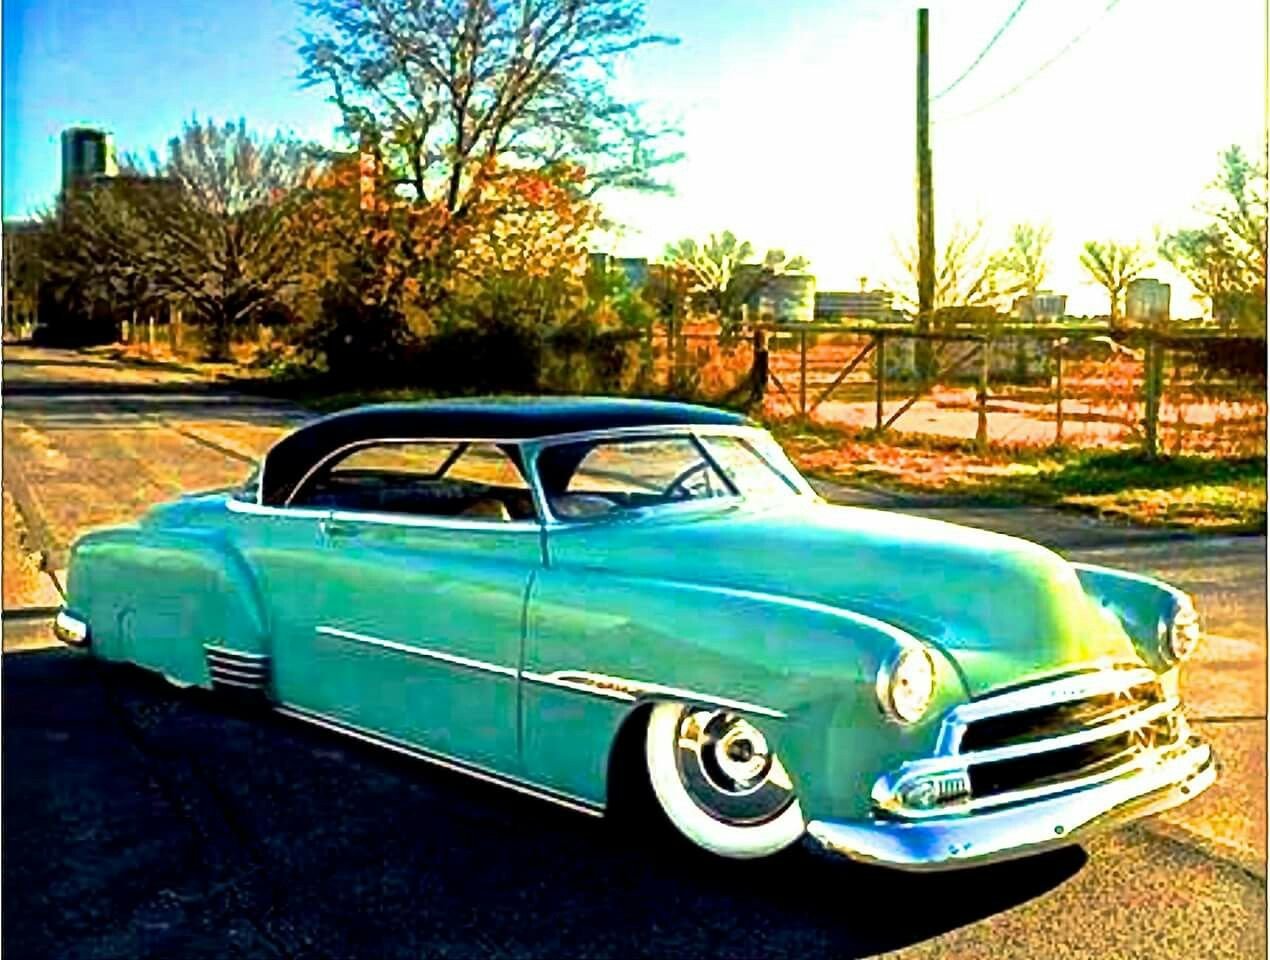 Pin By Kajus On Hodrod Old School Cars Custom Cars Classic Cars